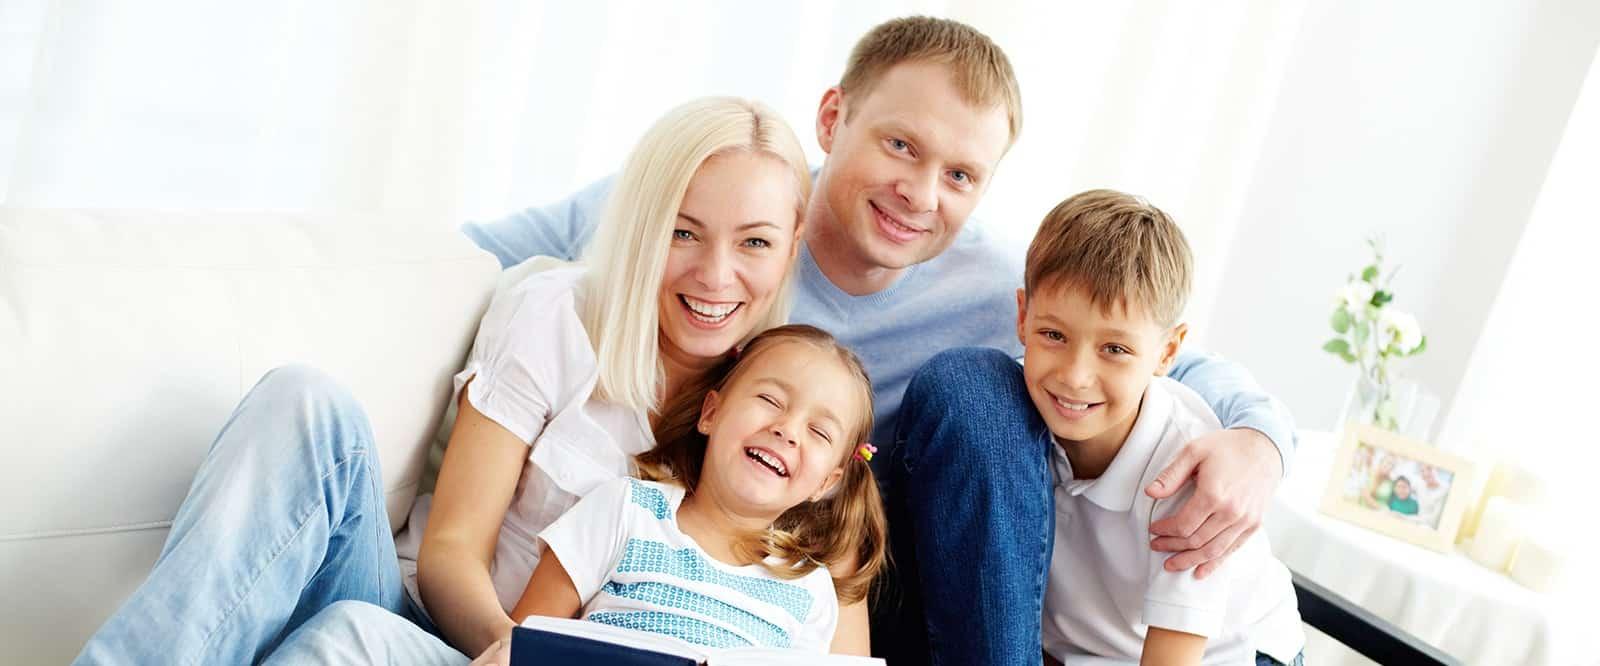 Apollo Dental in Ballantyne Dental Membership Plan